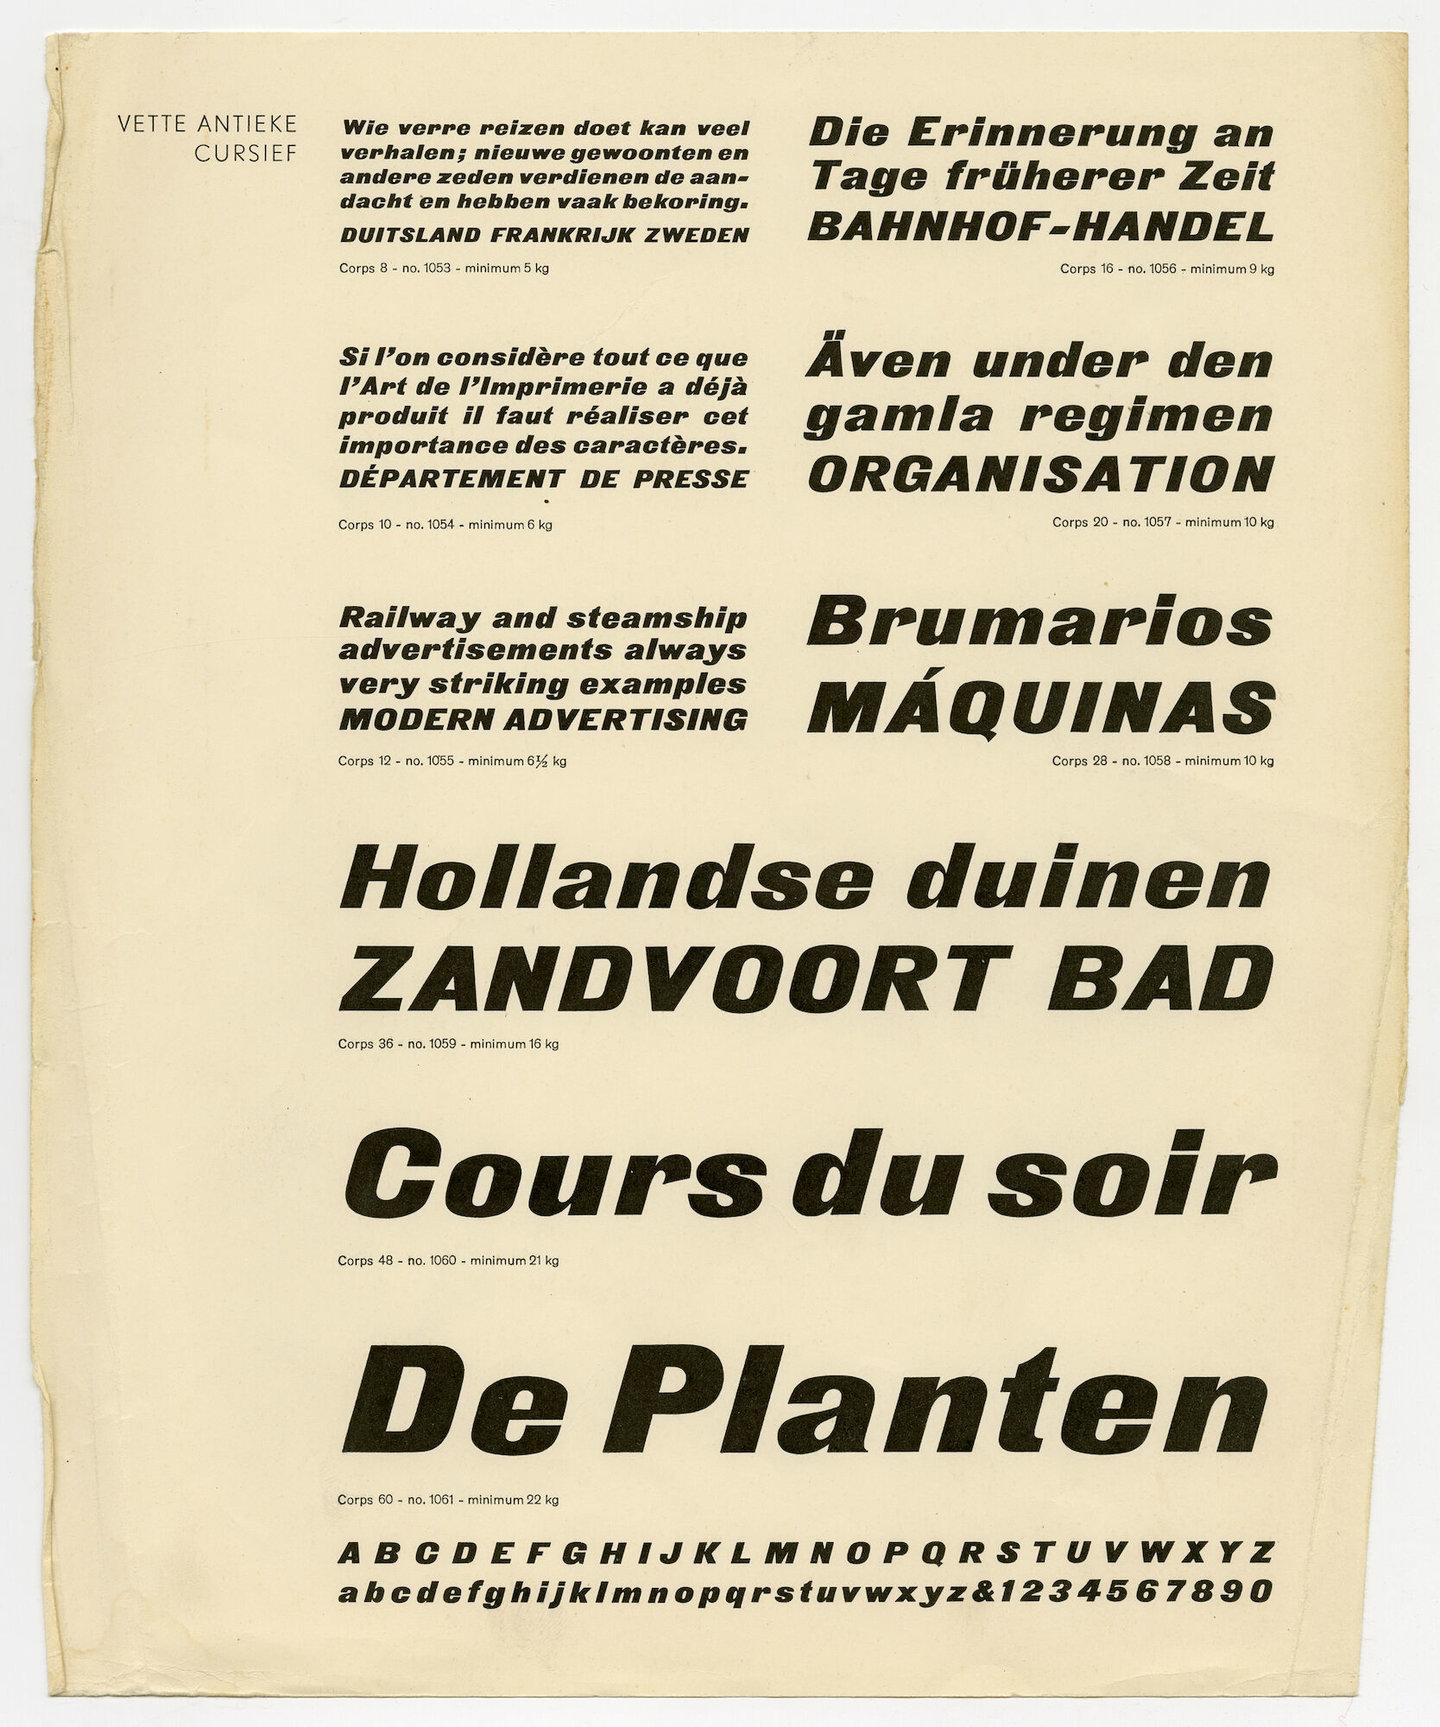 Letterproef met het lettertype Antieke van Plantin